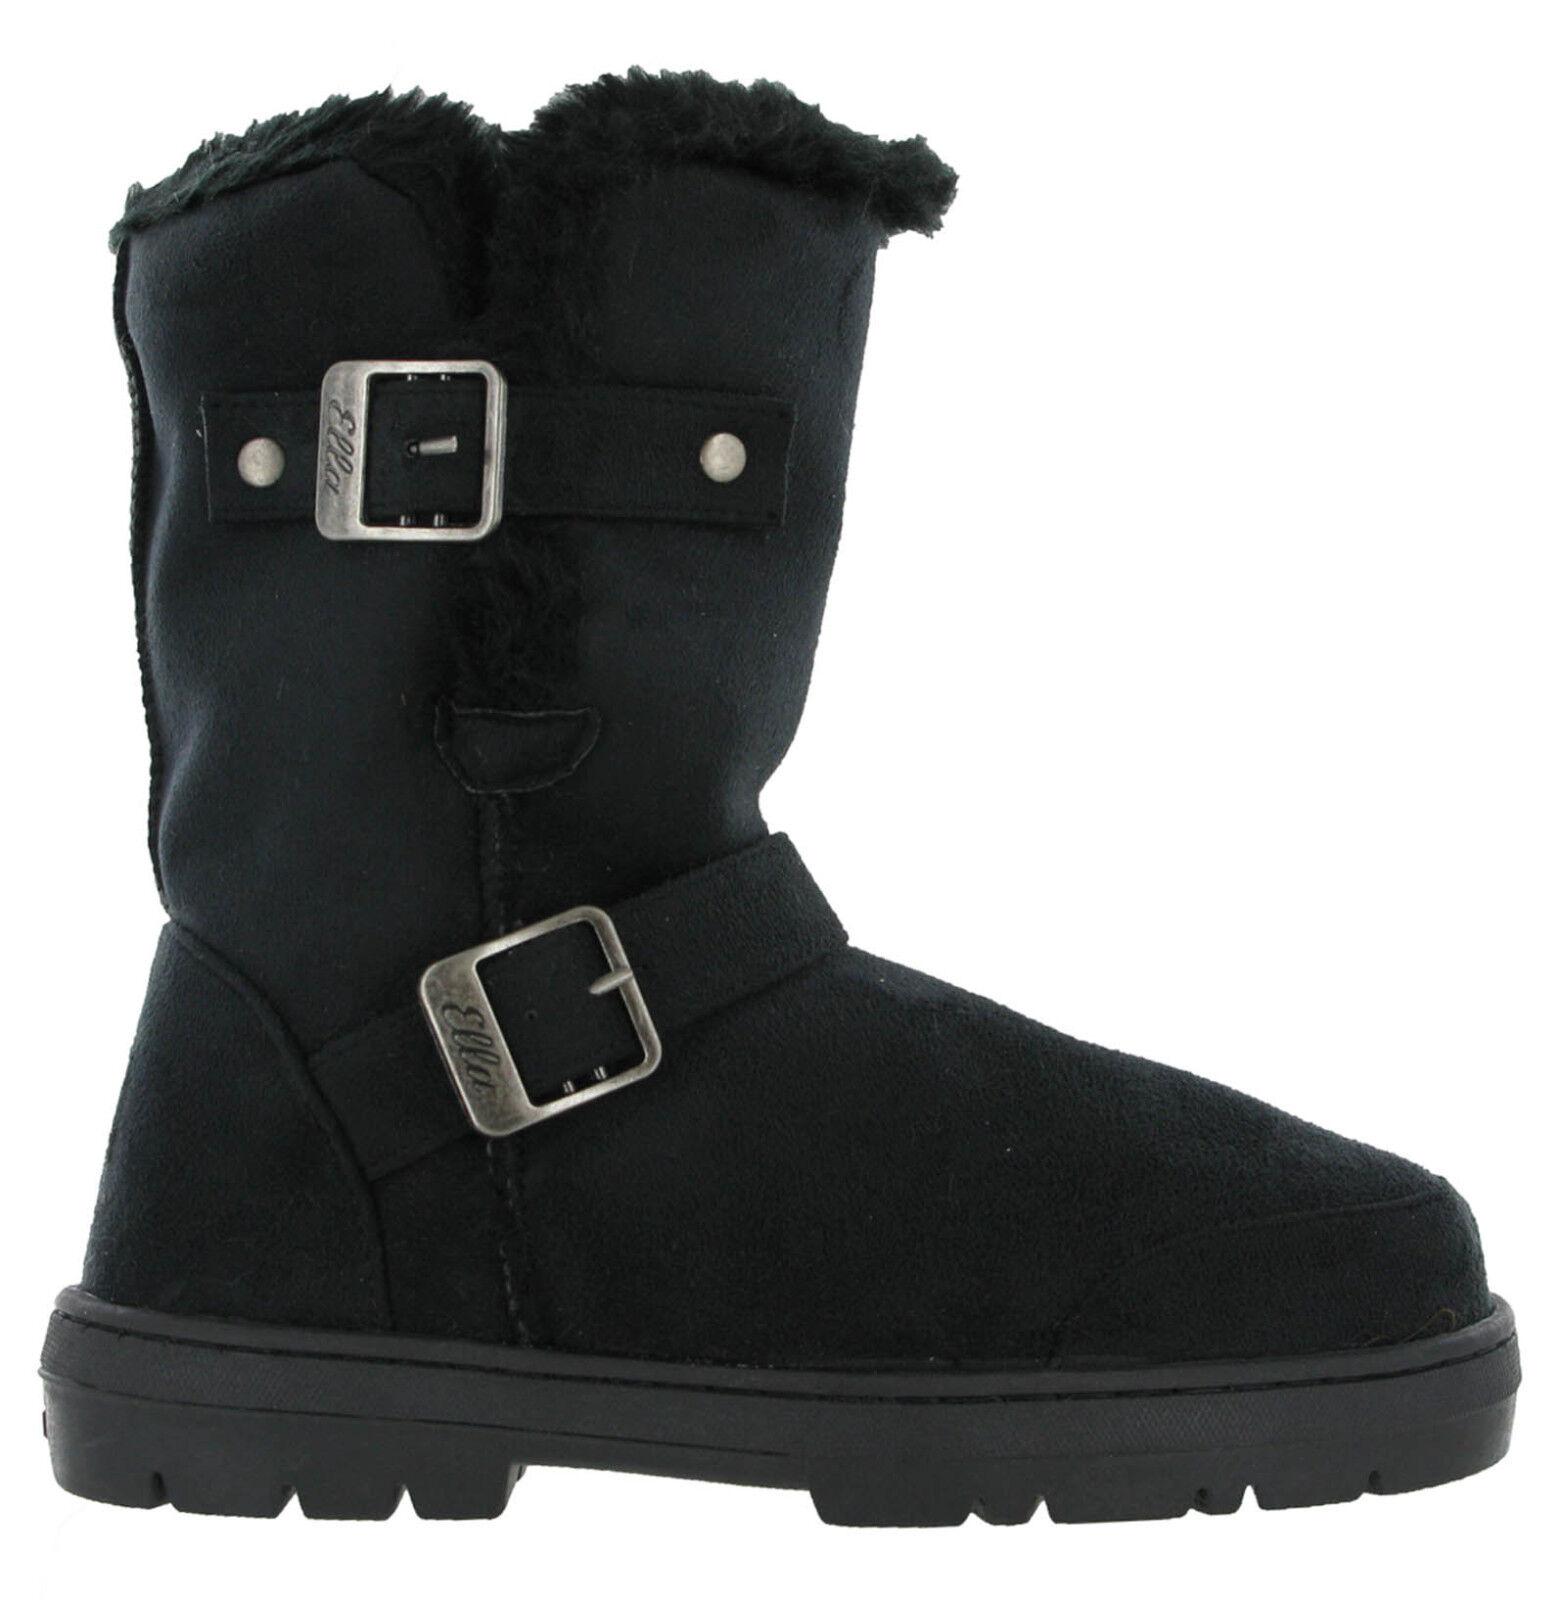 190bea5e989e Ella Fur Lined Alex Twin Buckle Snugg Warm Flat Womens Winter Boots UK 3 - 8